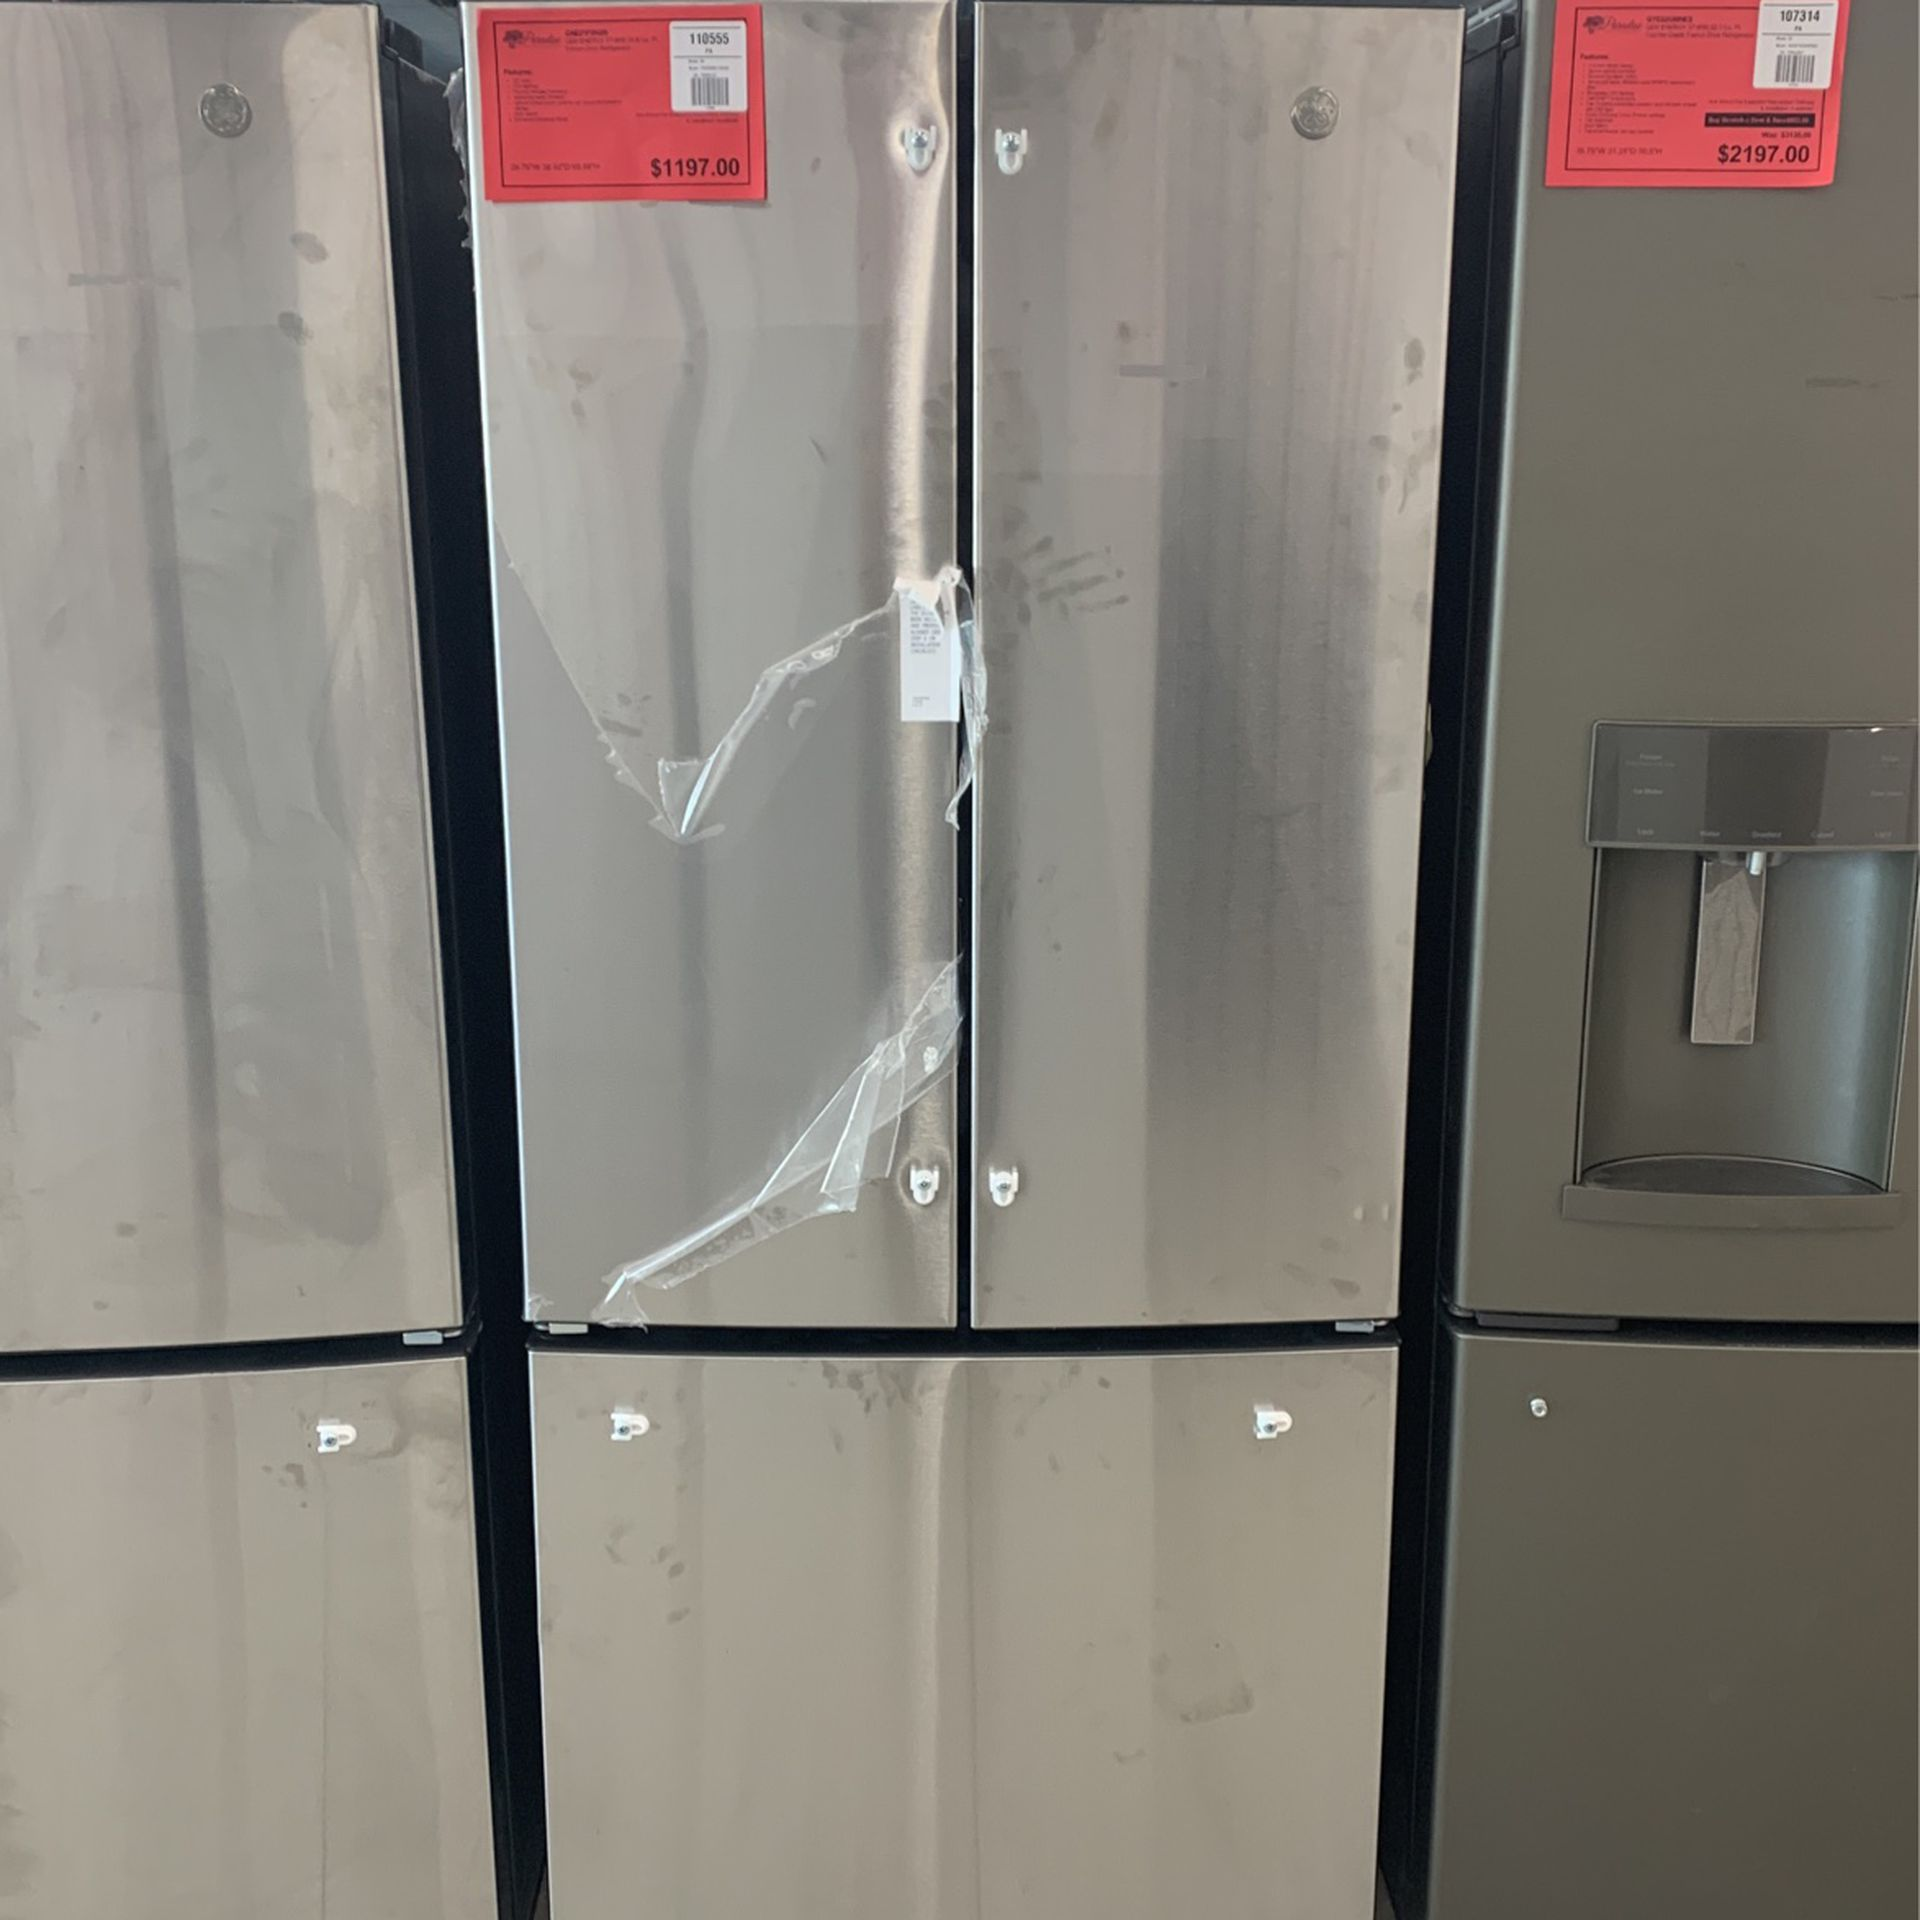 "New GE 30"" Stainless Steel Refrigerator!"